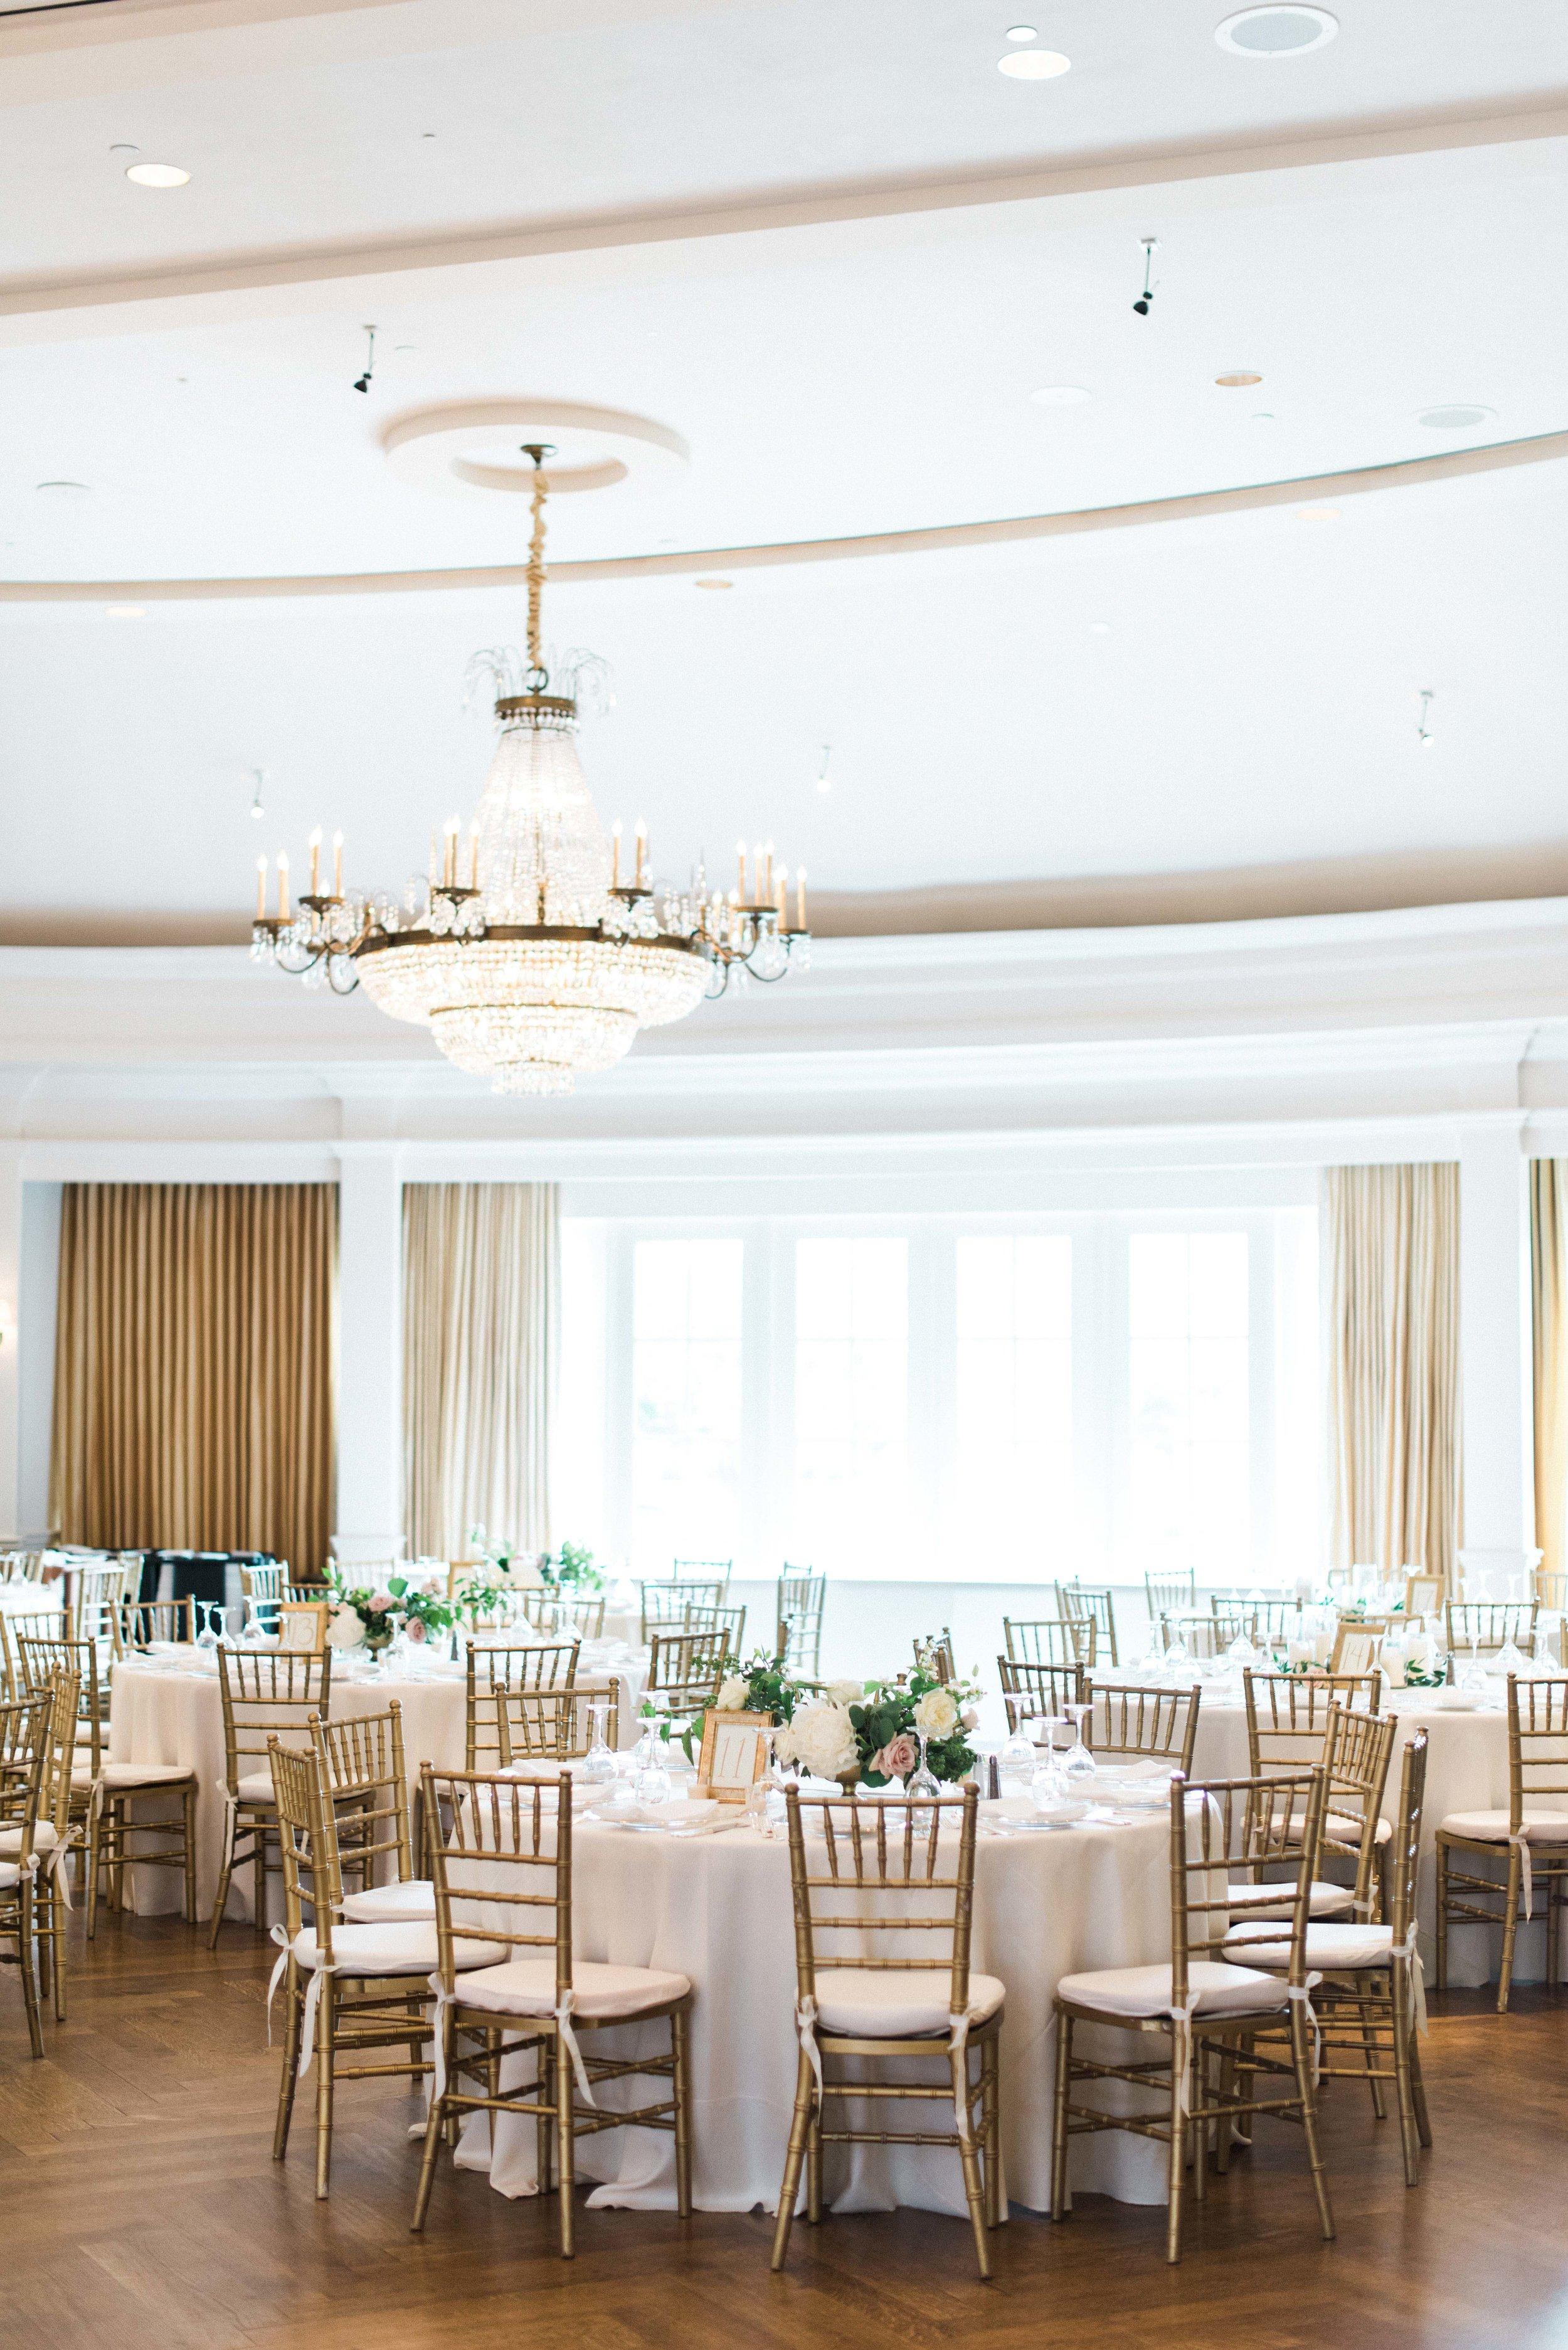 houston-wedding-planner-fine-art-luxury-designer-top-best-destination-austin-dallas-kelly-doonan-events-river-oaks-country-club-189